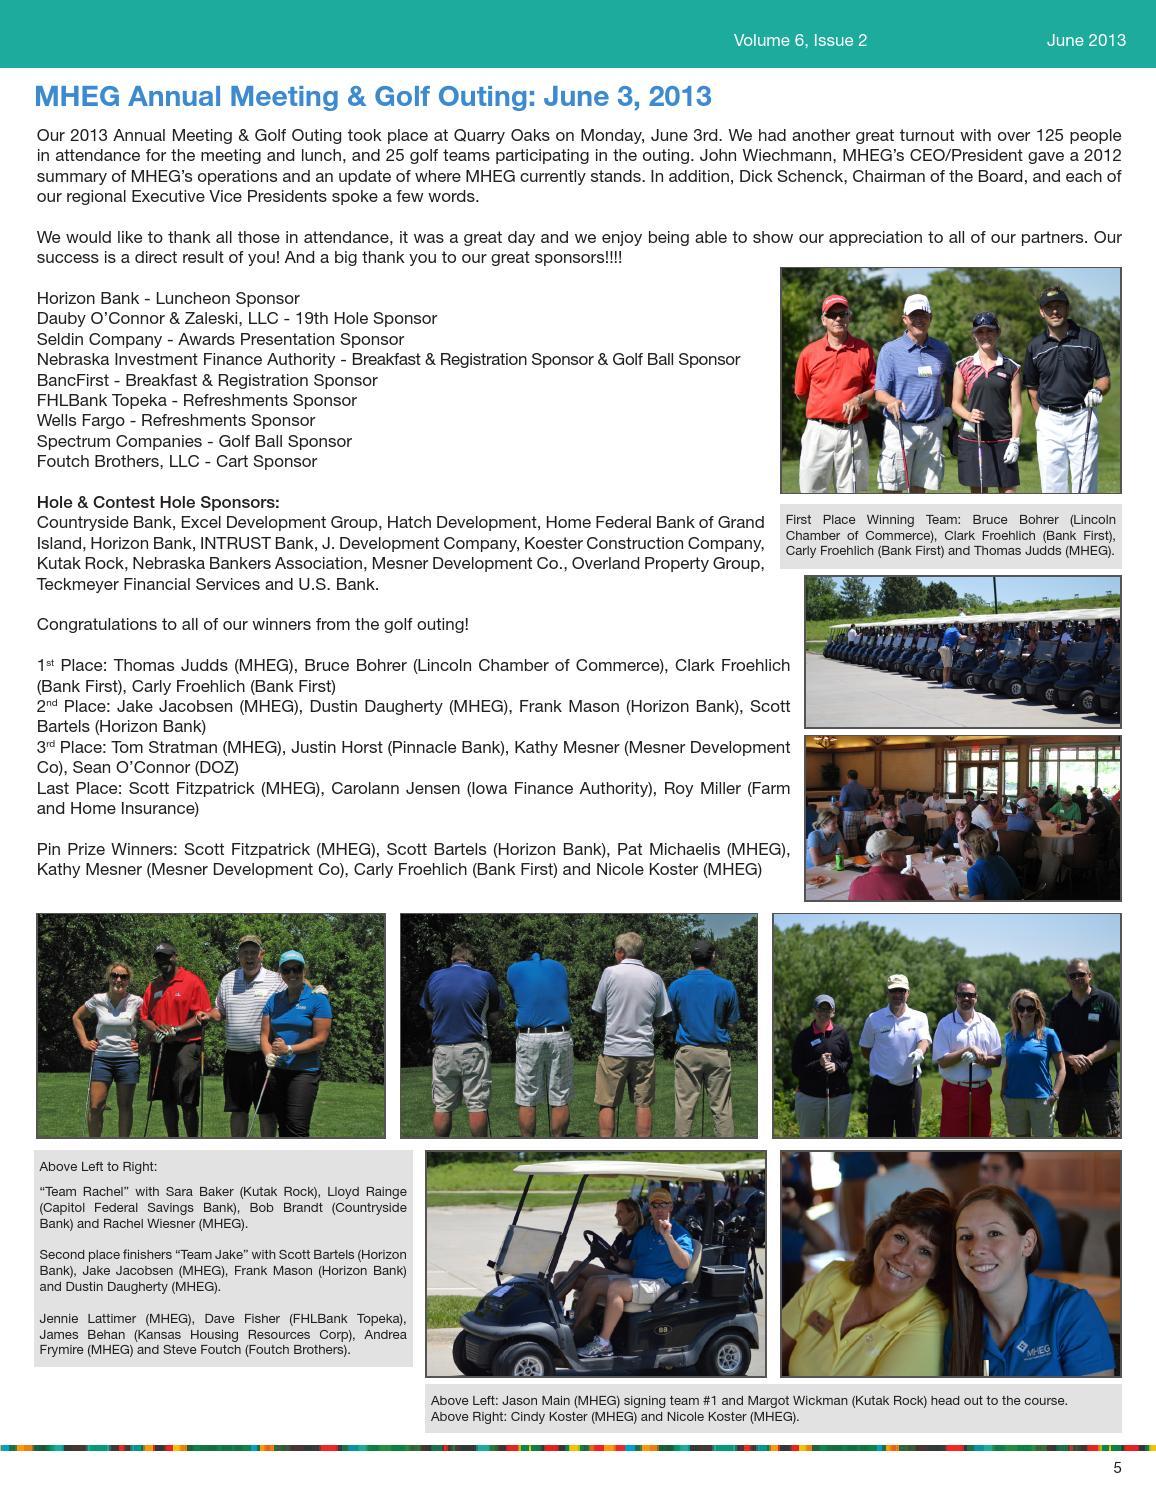 Jun 2013 newsletter by MHEGINC - issuu